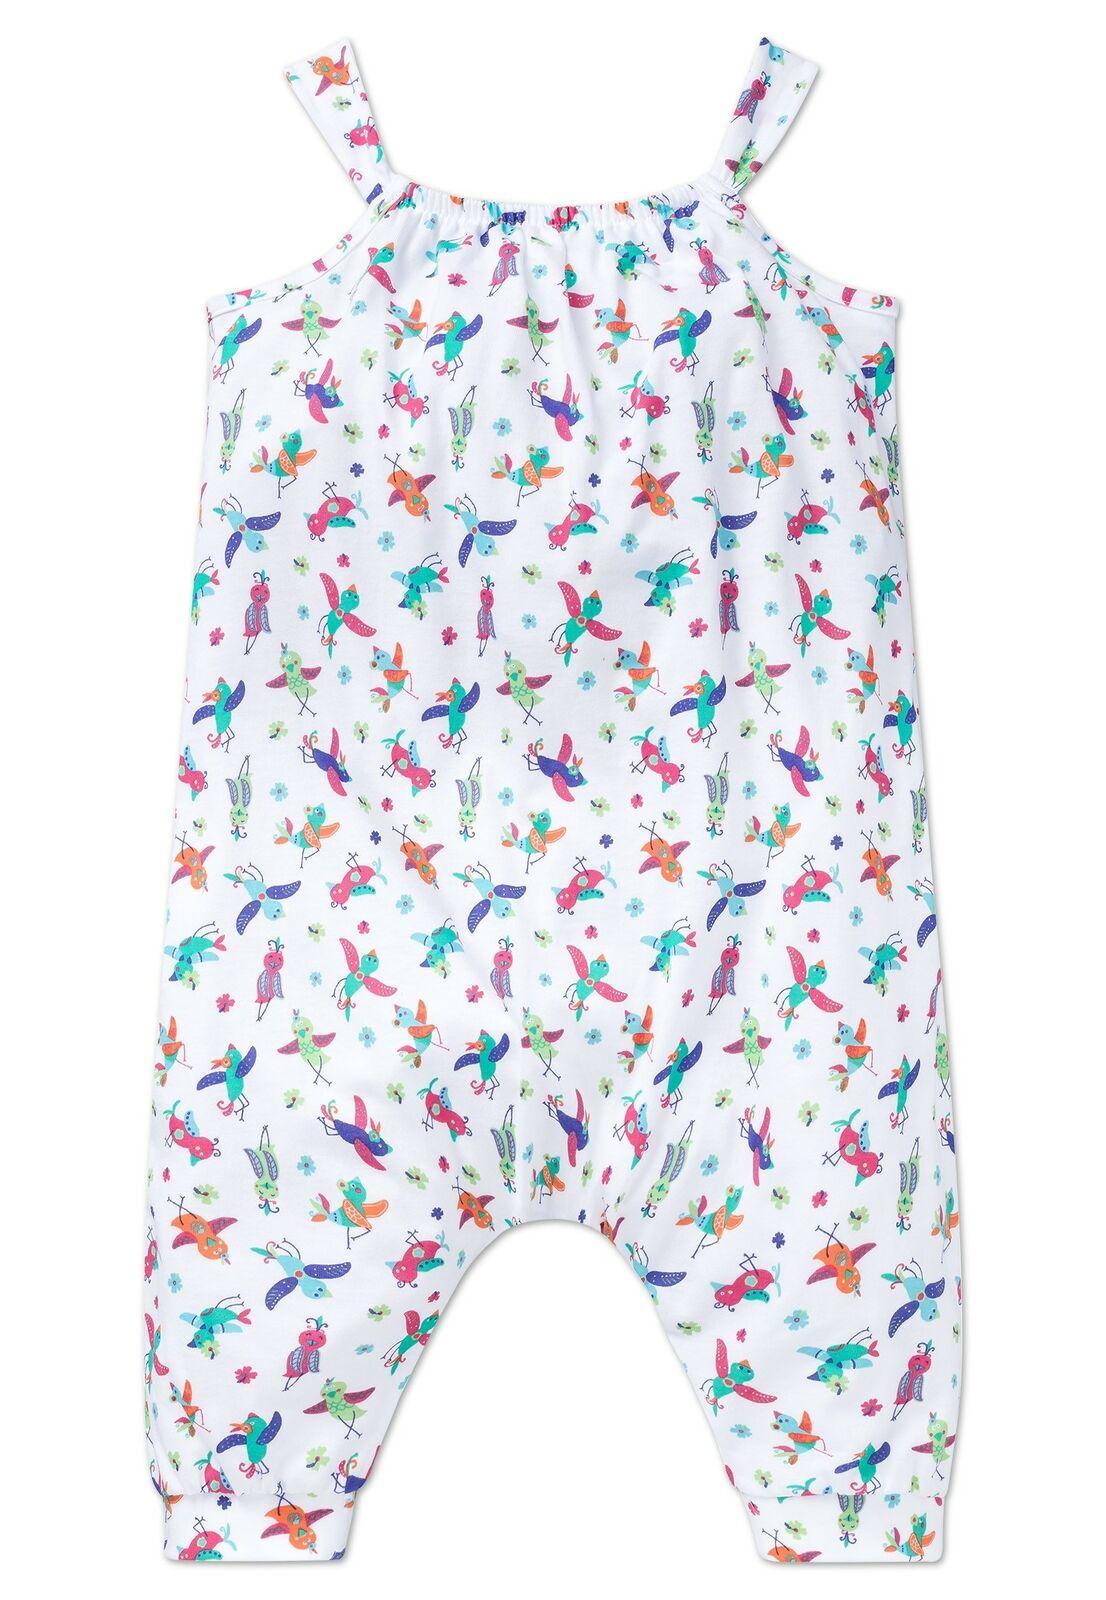 SCHIESSER Mädchen Schlafanzug Pyjama Overall Jumpsuit Tropical Bird NEU*UVP24,95